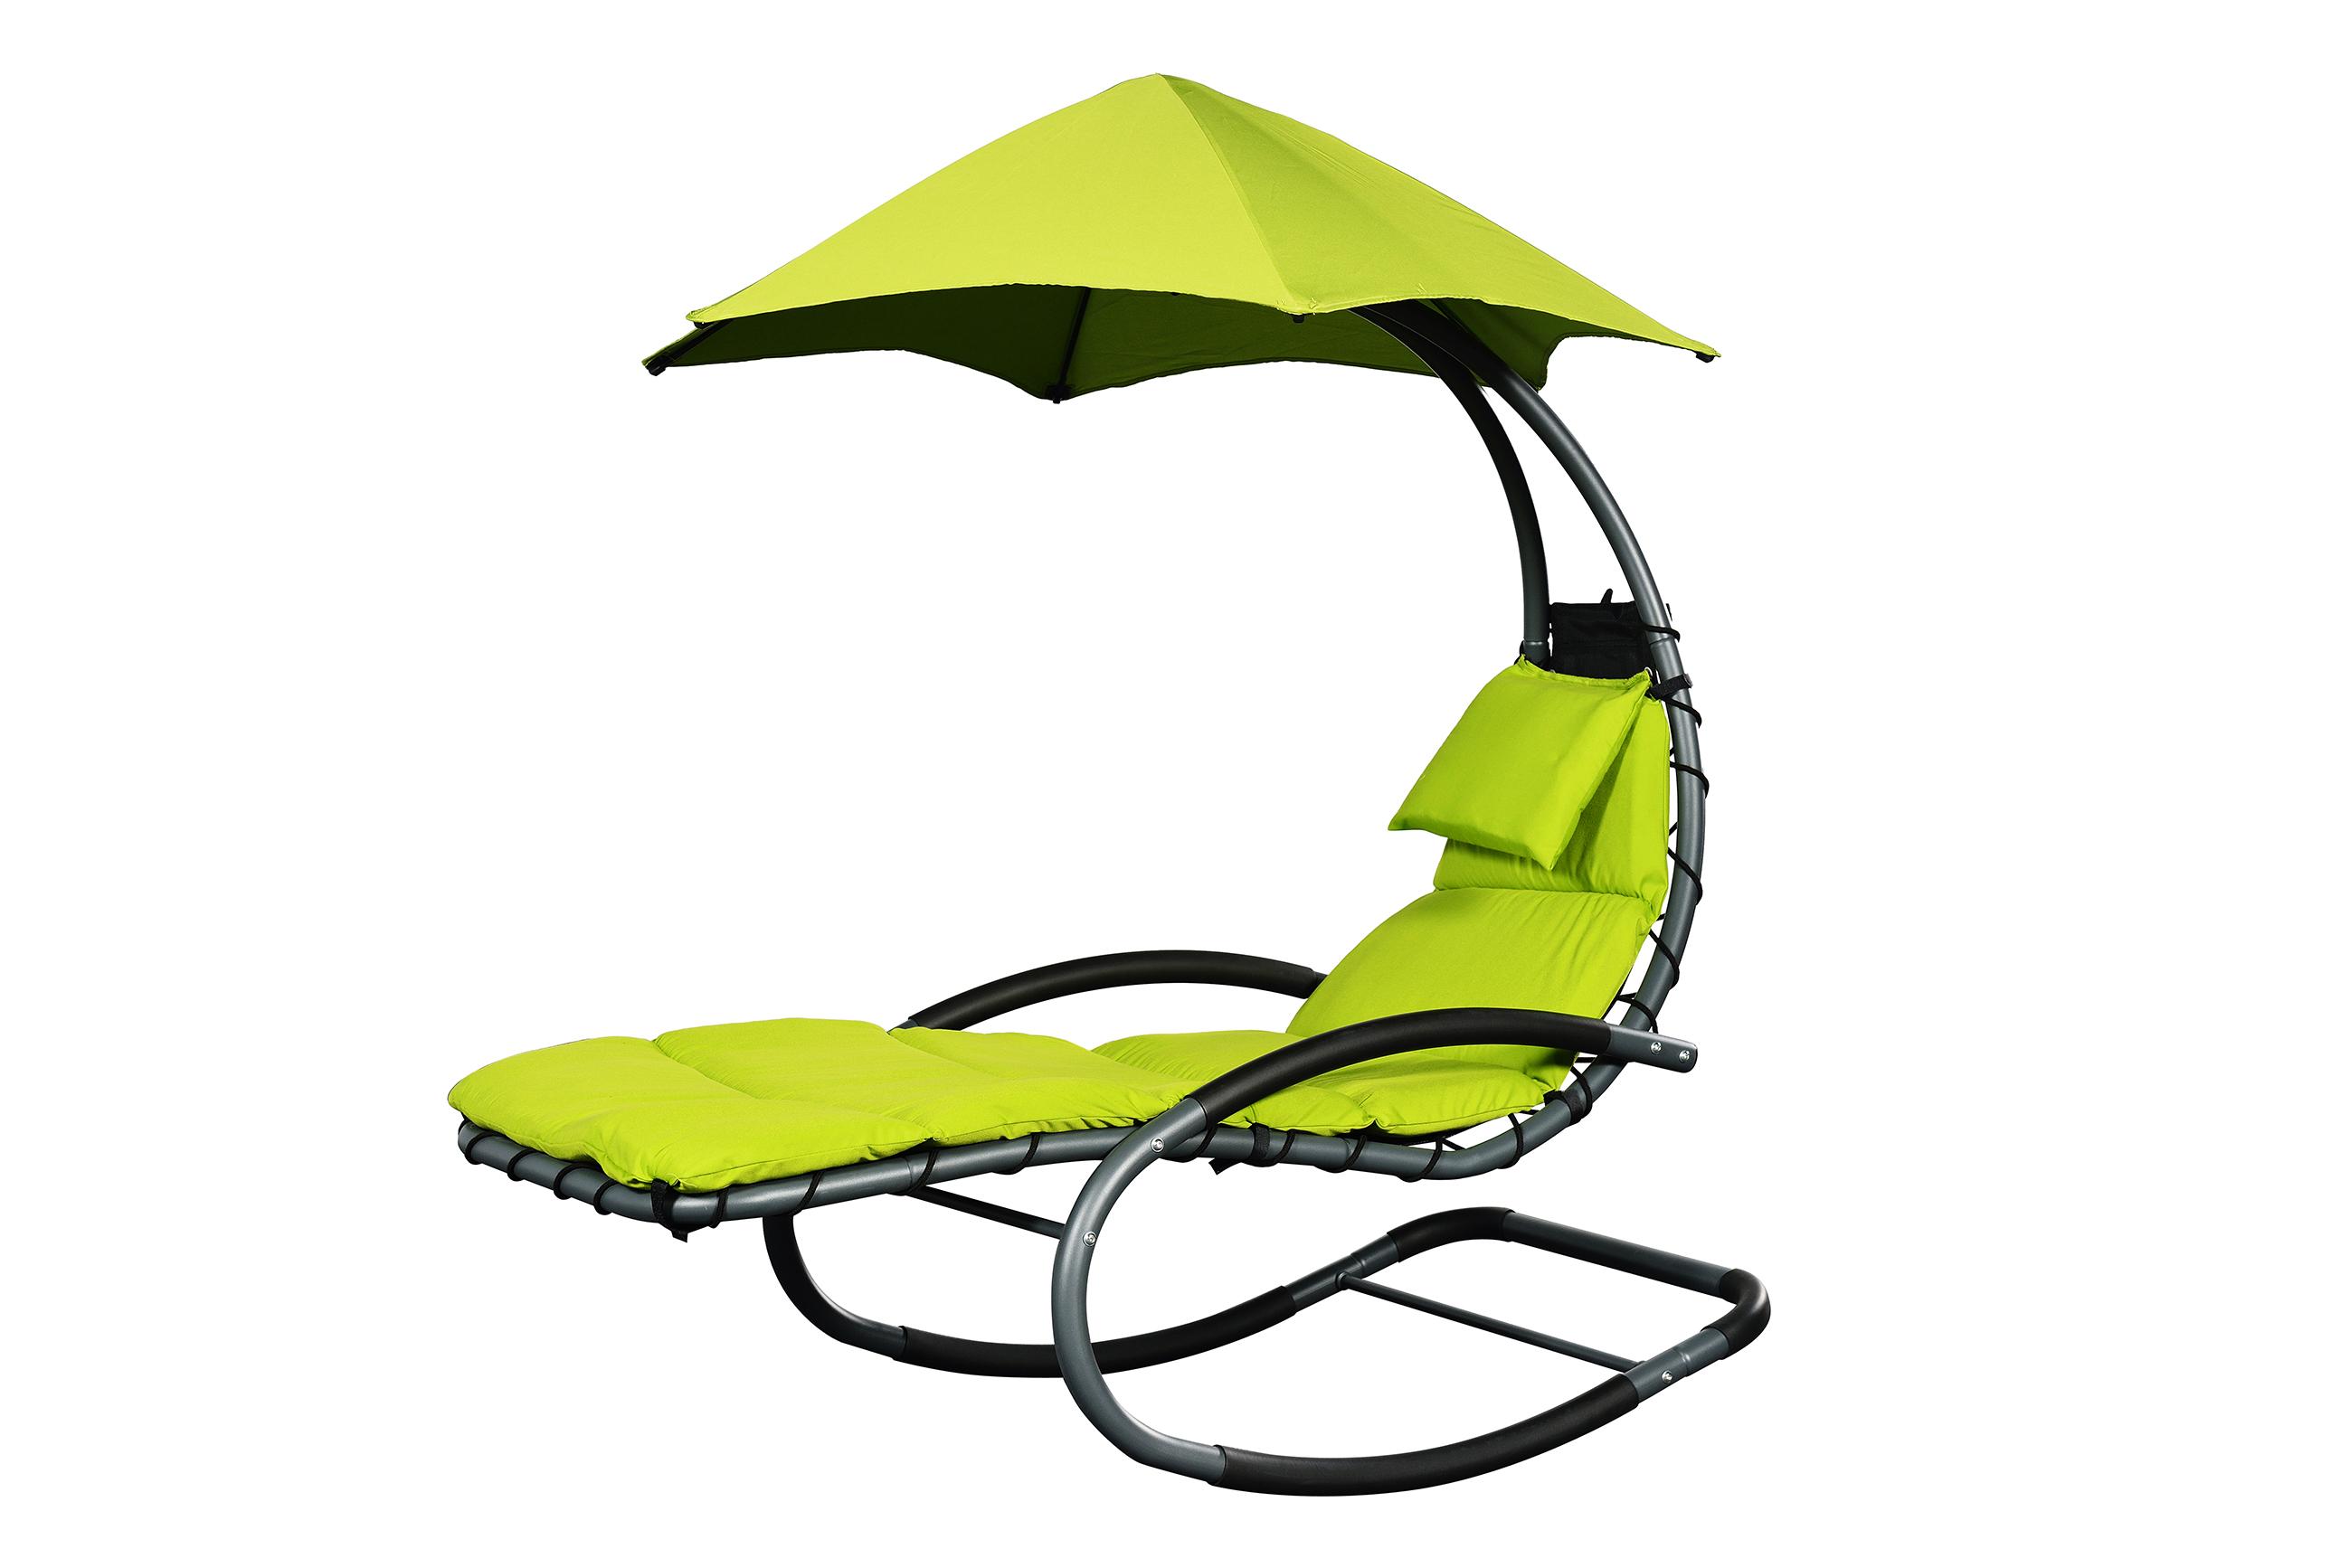 Nest Swing Chaise Swing Longue Prosolis Nest Prosolis Chaise Prosolis Longue Chaise Longue 8Ov0wymNn